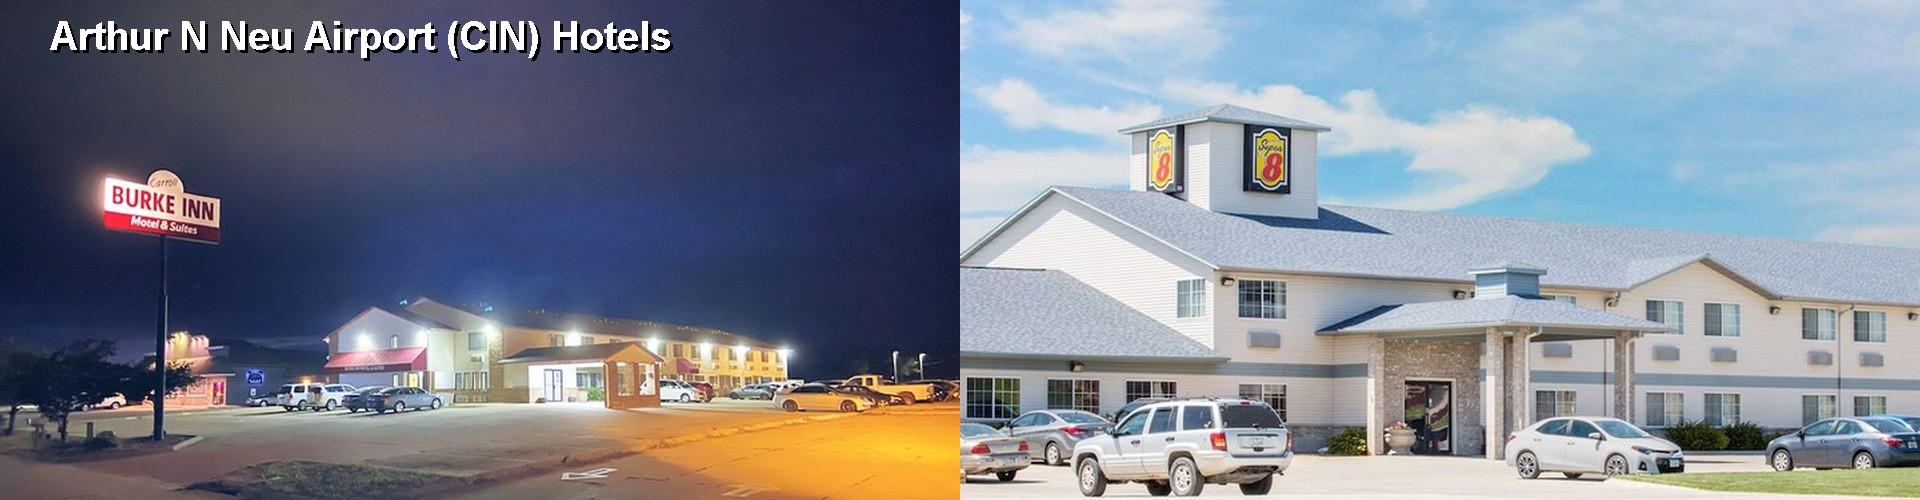 Hotels Near Arthur N Neu Airport Cin In Carroll Ia